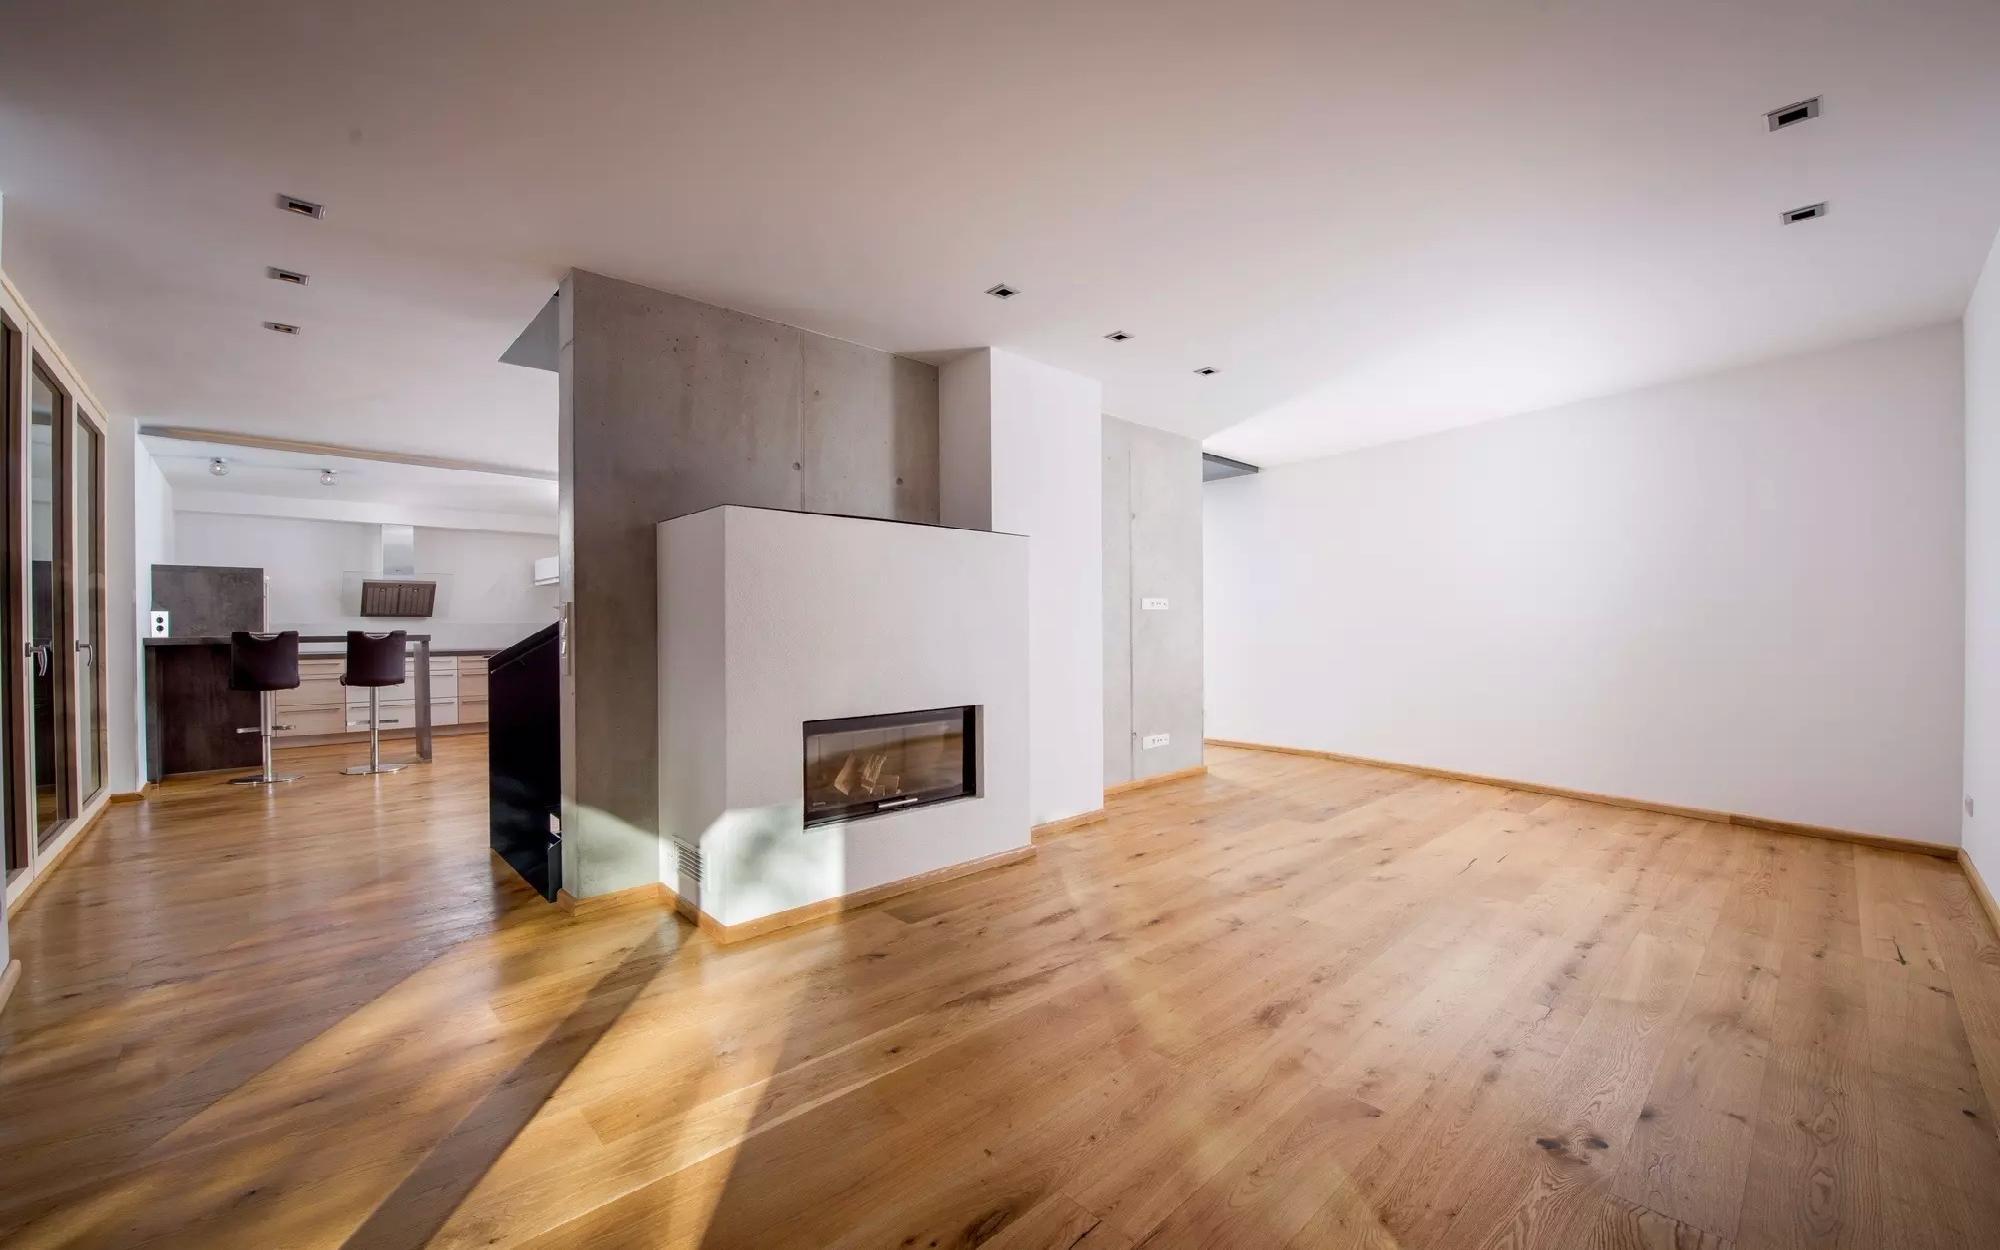 Immobilien - Modernes Wohnhausteil in St. Johann in Tirol , St. Johann in Tirol